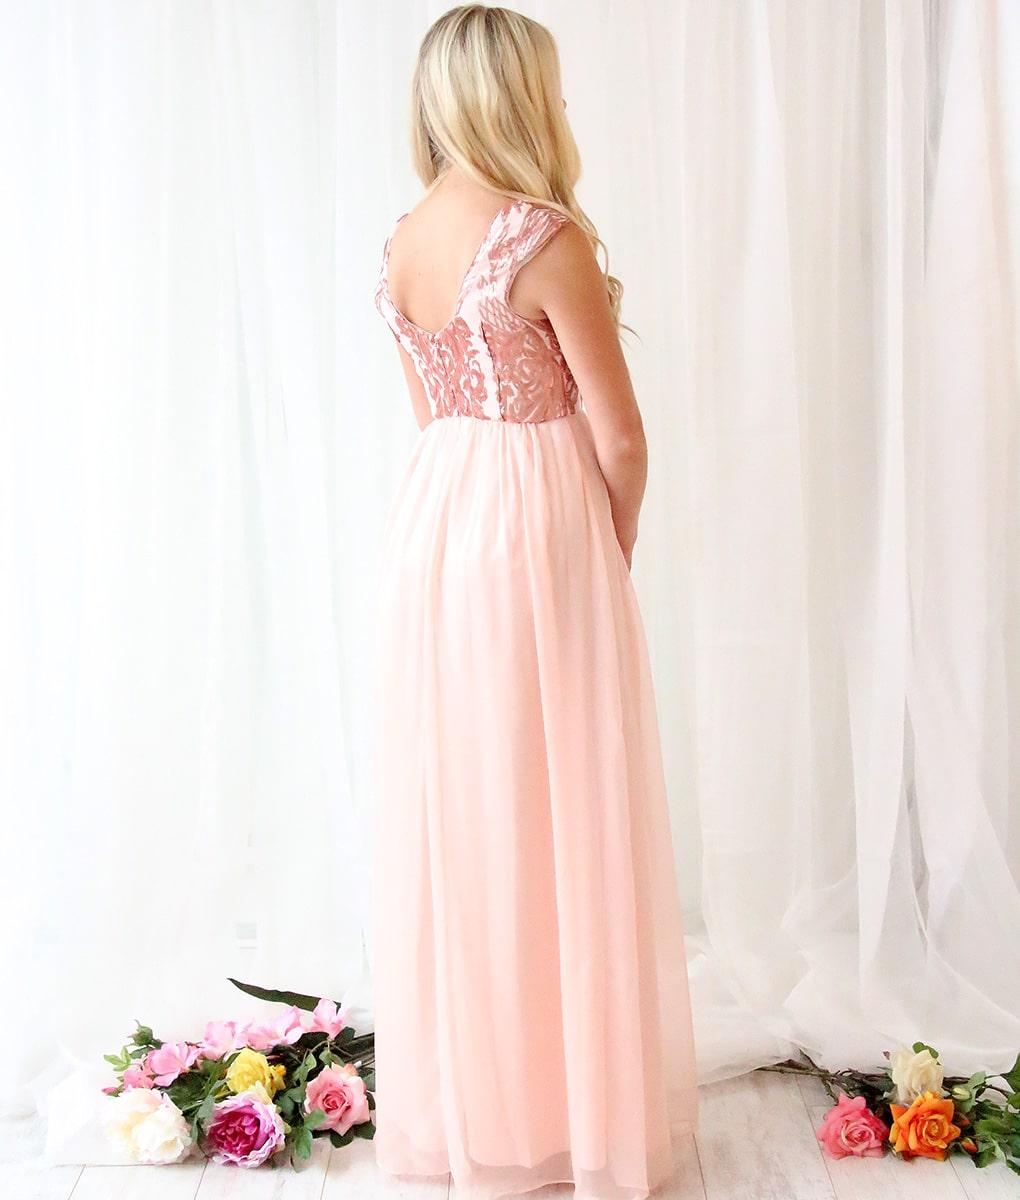 Alila-Blush-Chiffon-long-gown-Bariano